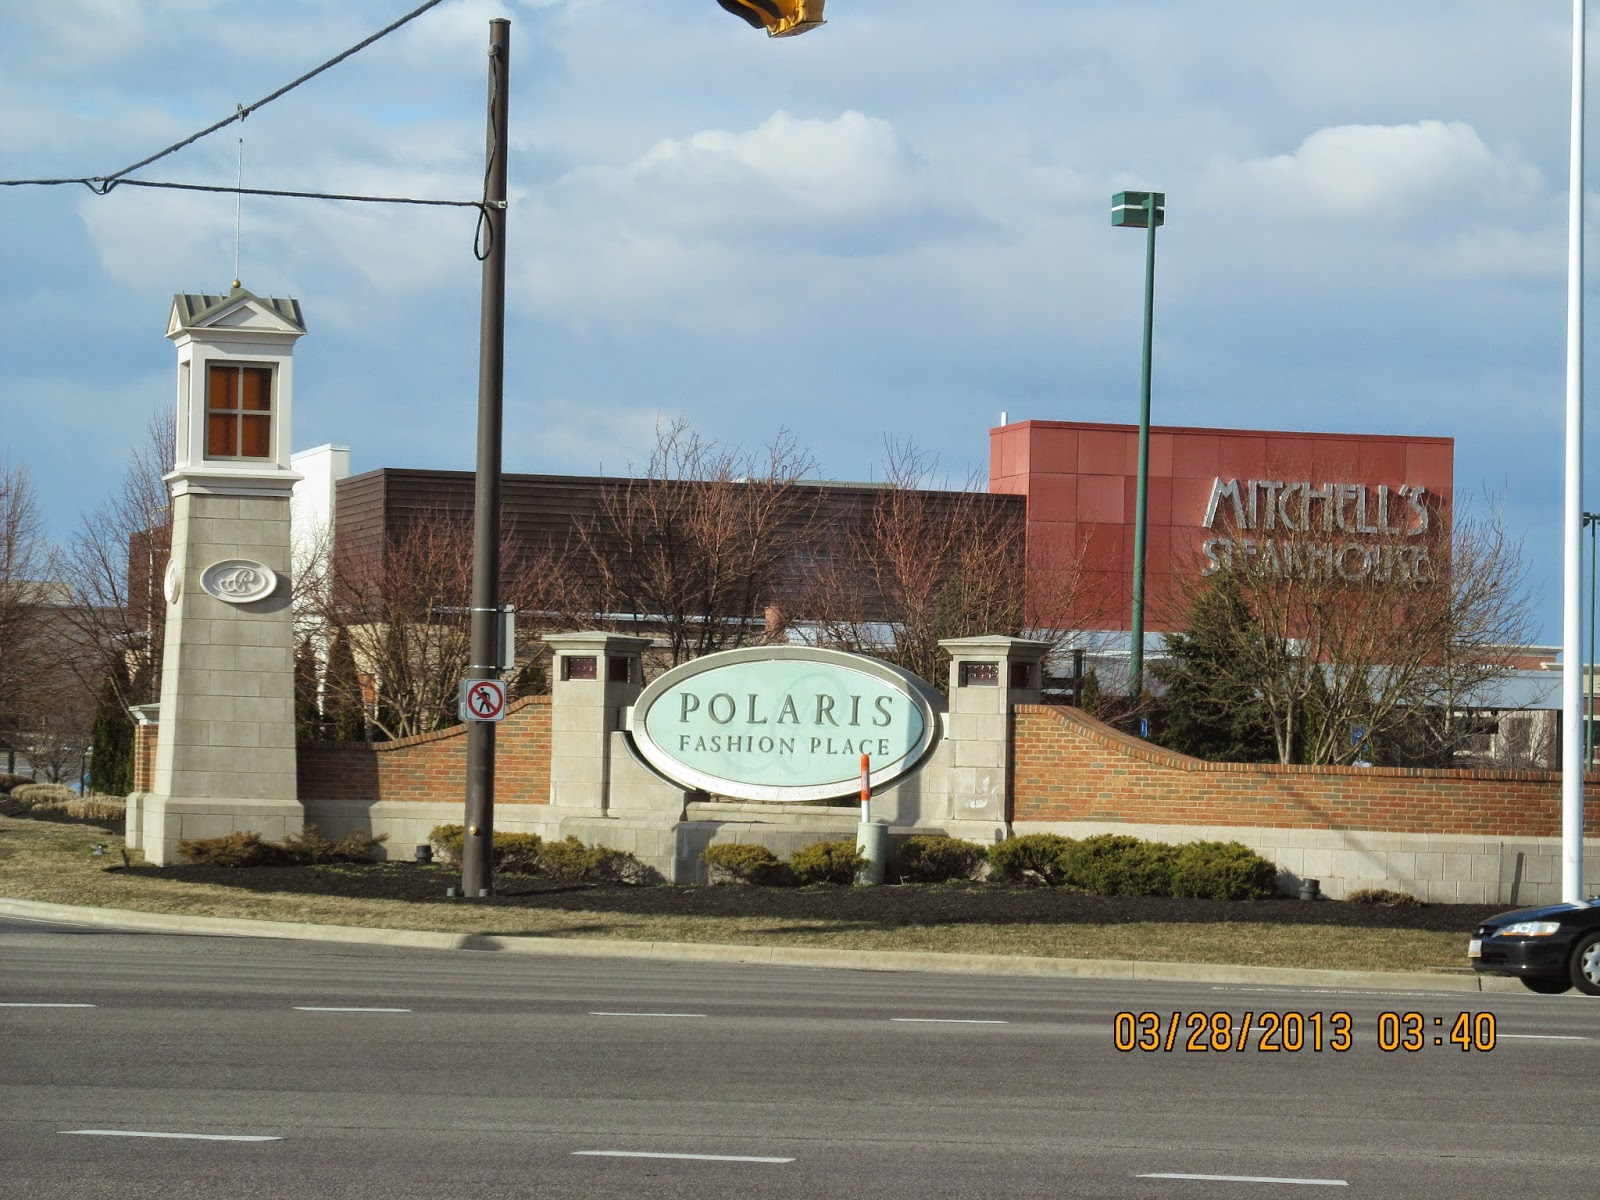 Trip to the Mall: Polaris Fashion Place- (Columbus, OH)